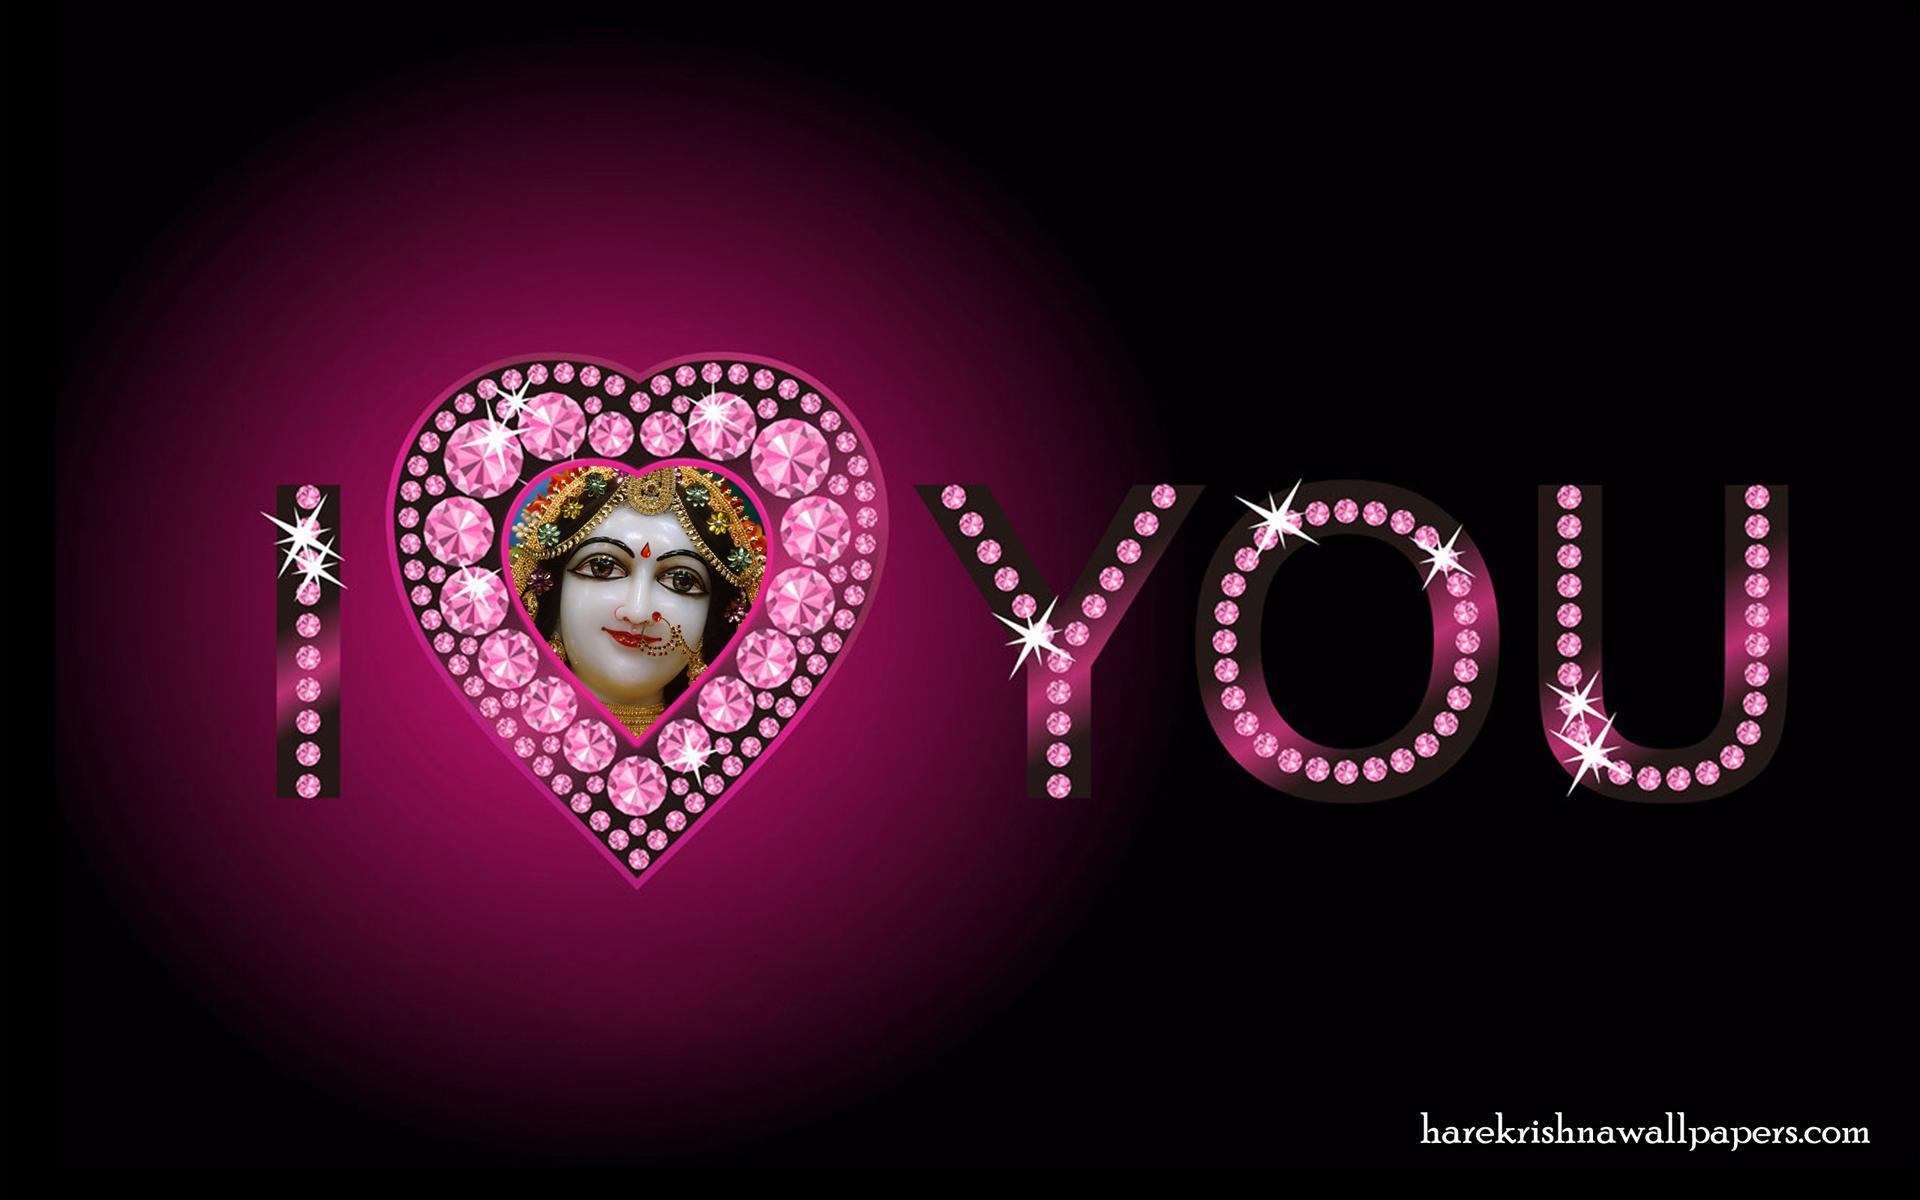 I Love You Radharani Wallpaper (012) Size 1920x1200 Download